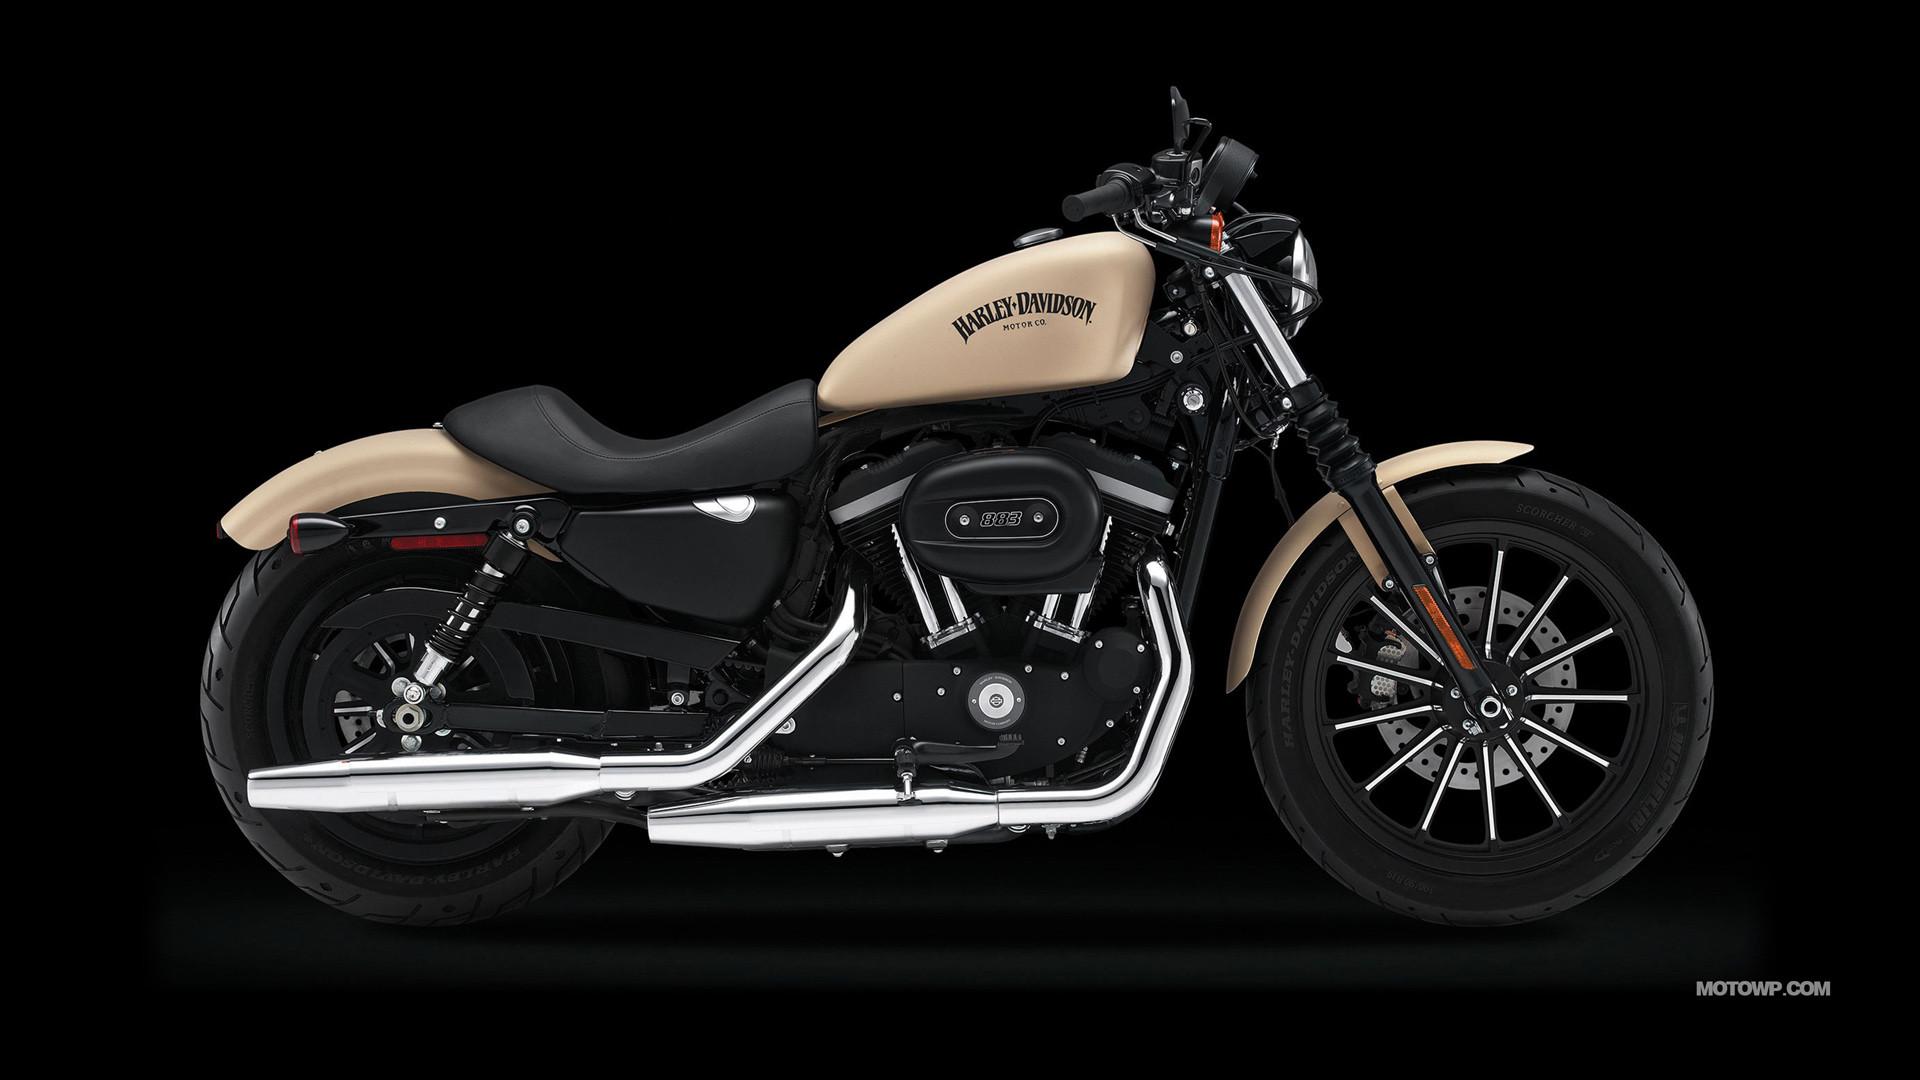 2808x1872 Harley Davidson Sportster Iron 883 Wallpaper